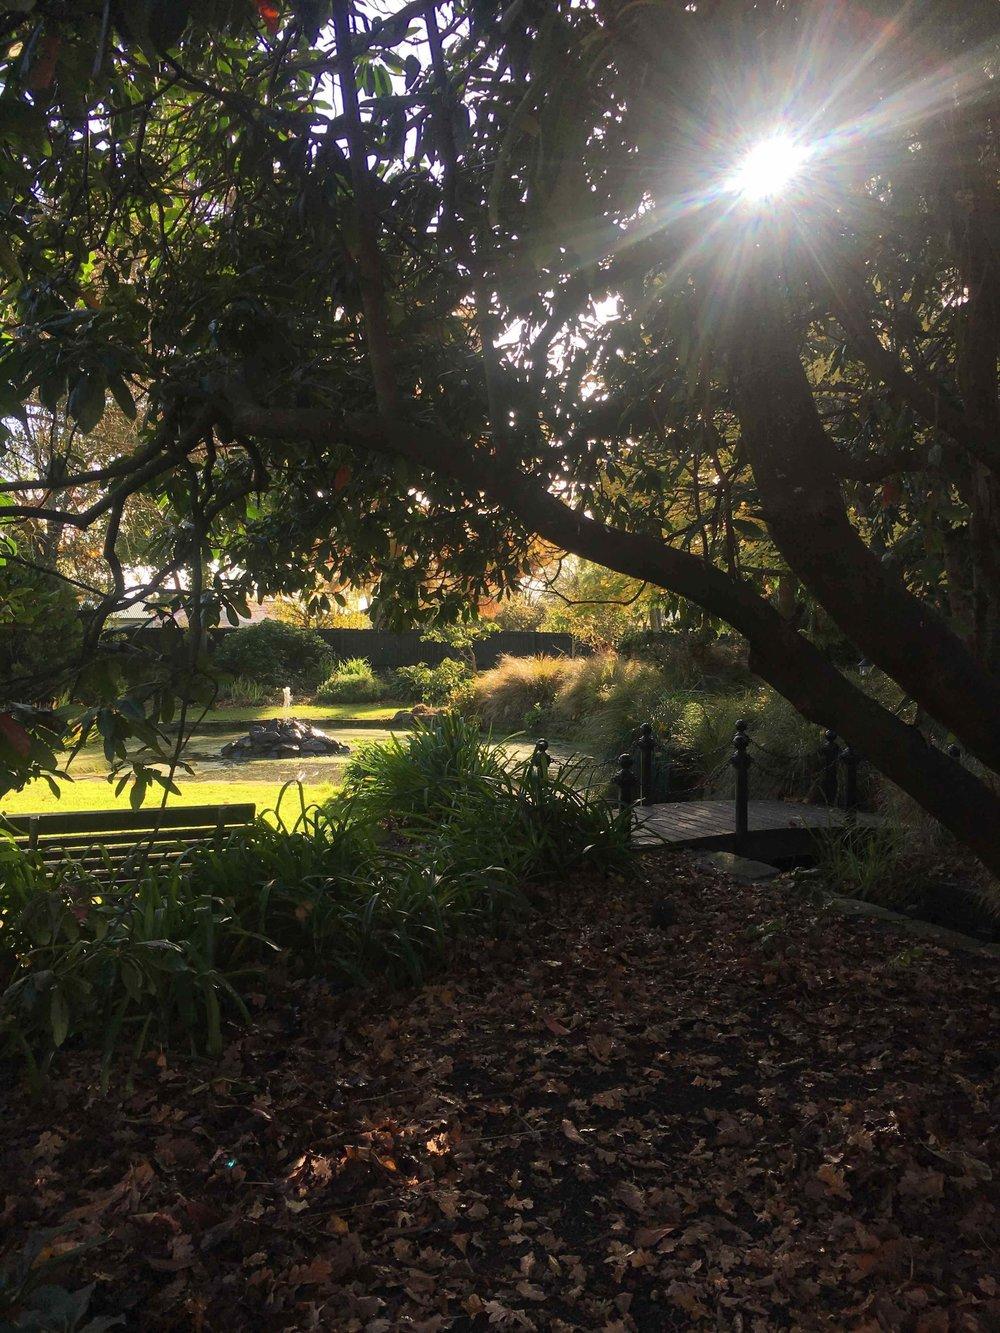 4. Explore Edmonds Factory Gardens